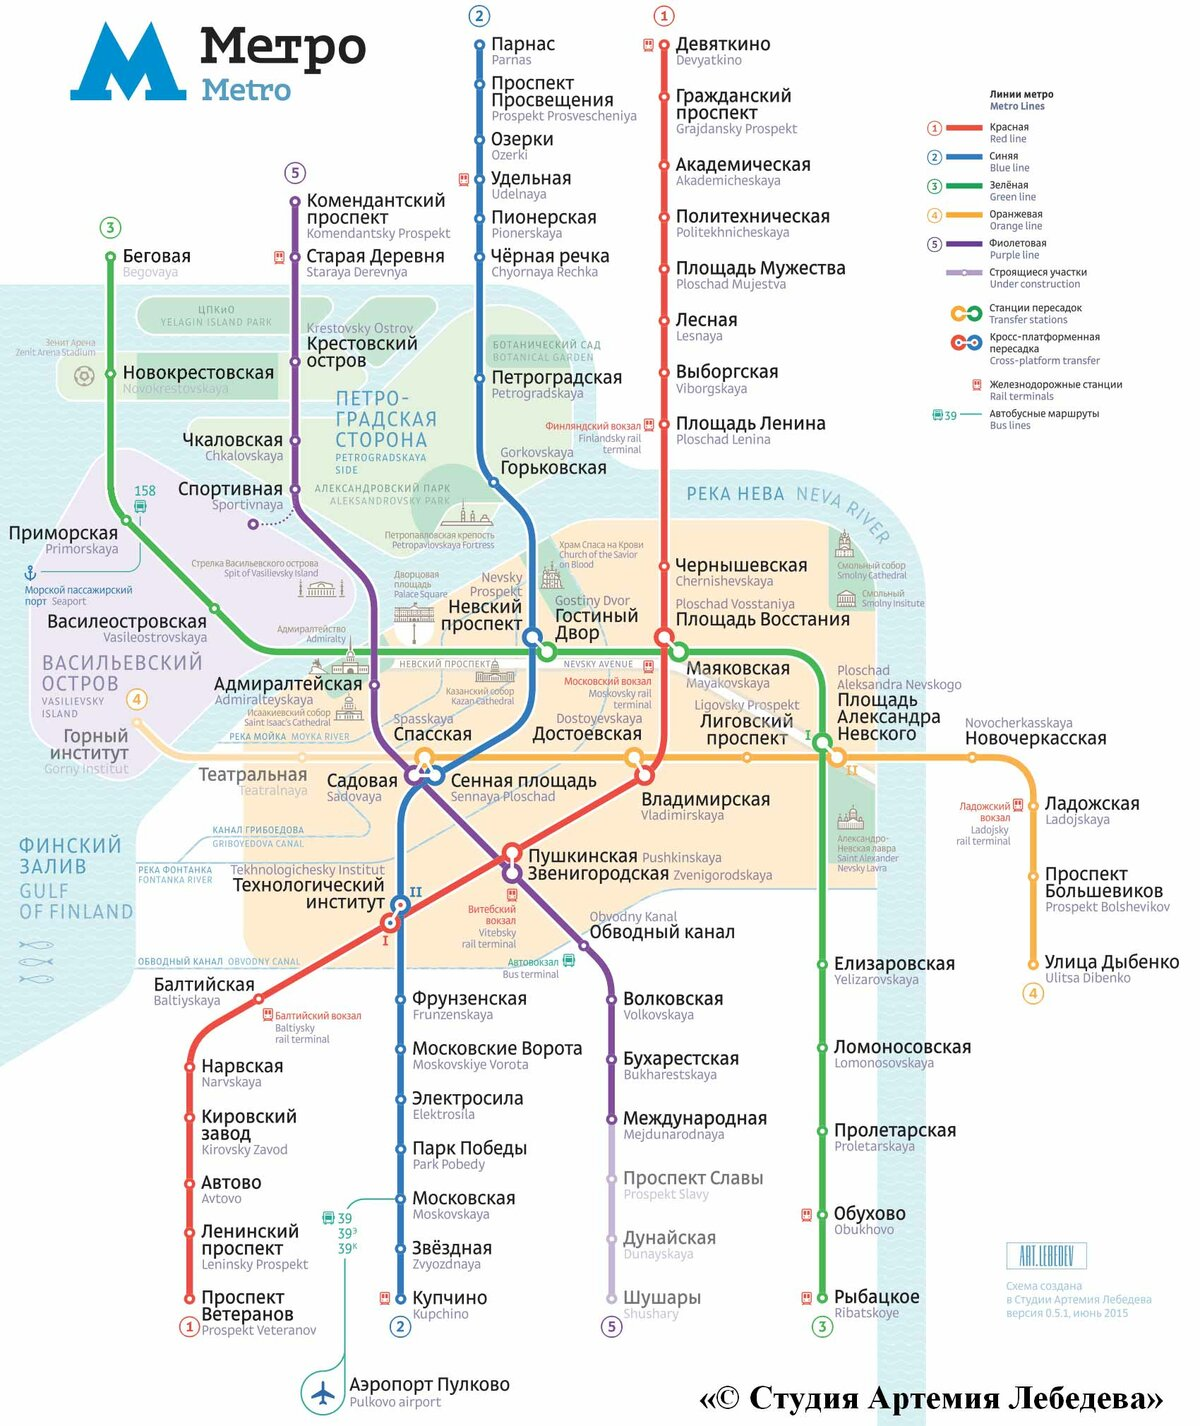 Картинка схемы метро спб